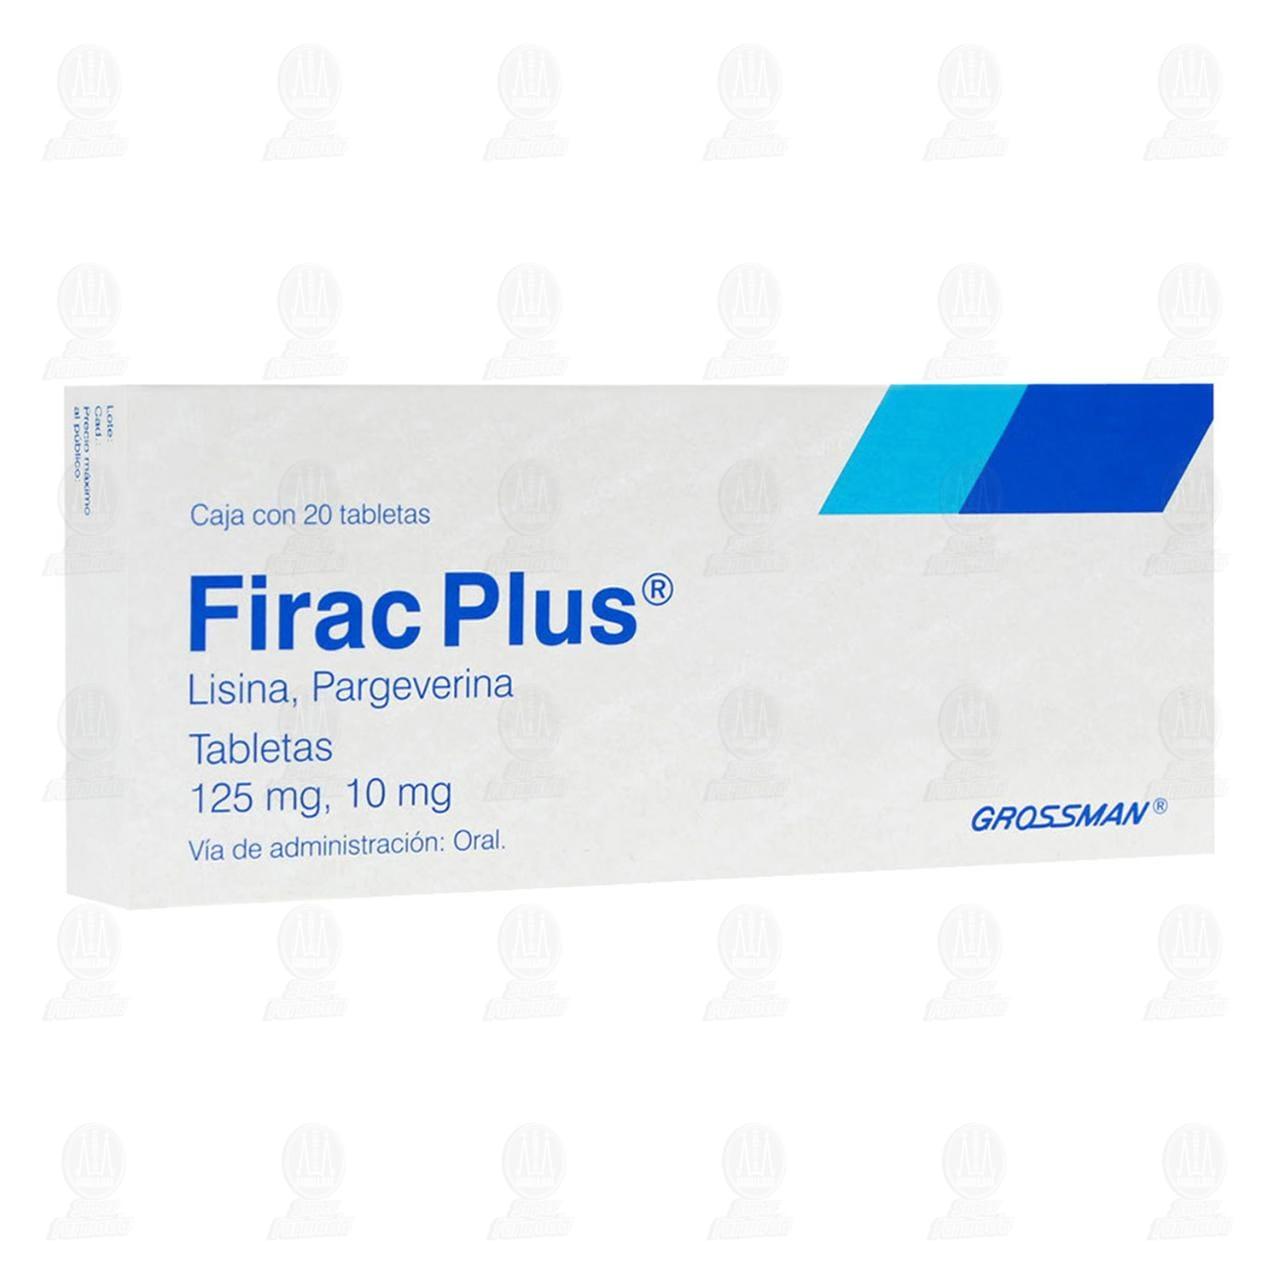 Firac Plus 125mg/10mg 20 Tabletas